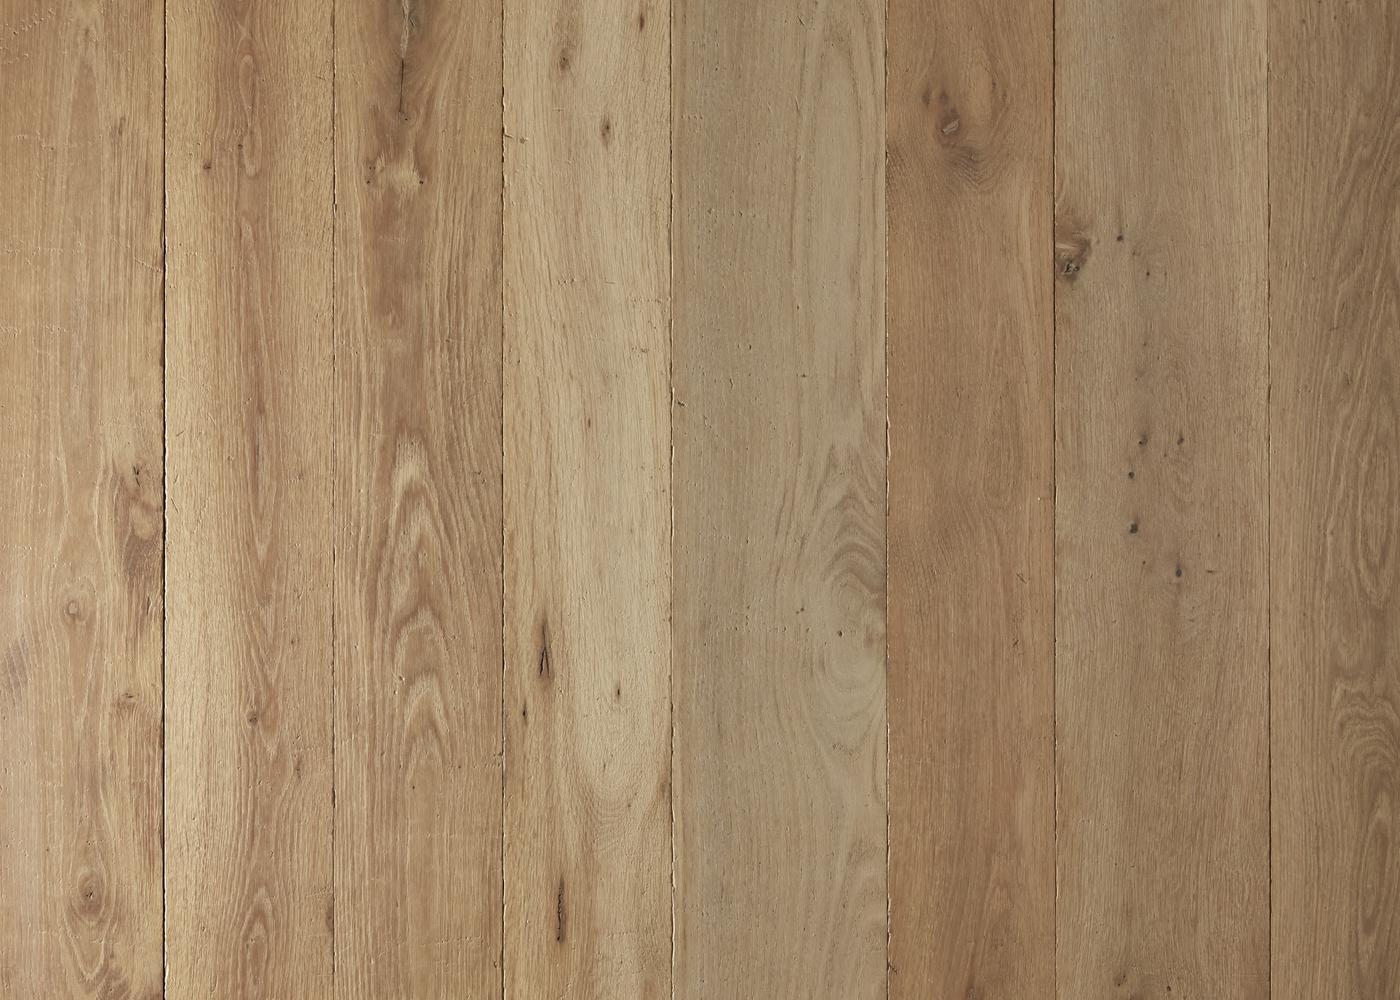 Lot 75 - Parquet chêne contrecollé vieilli Brun Clair huile aqua - 41,97 m2